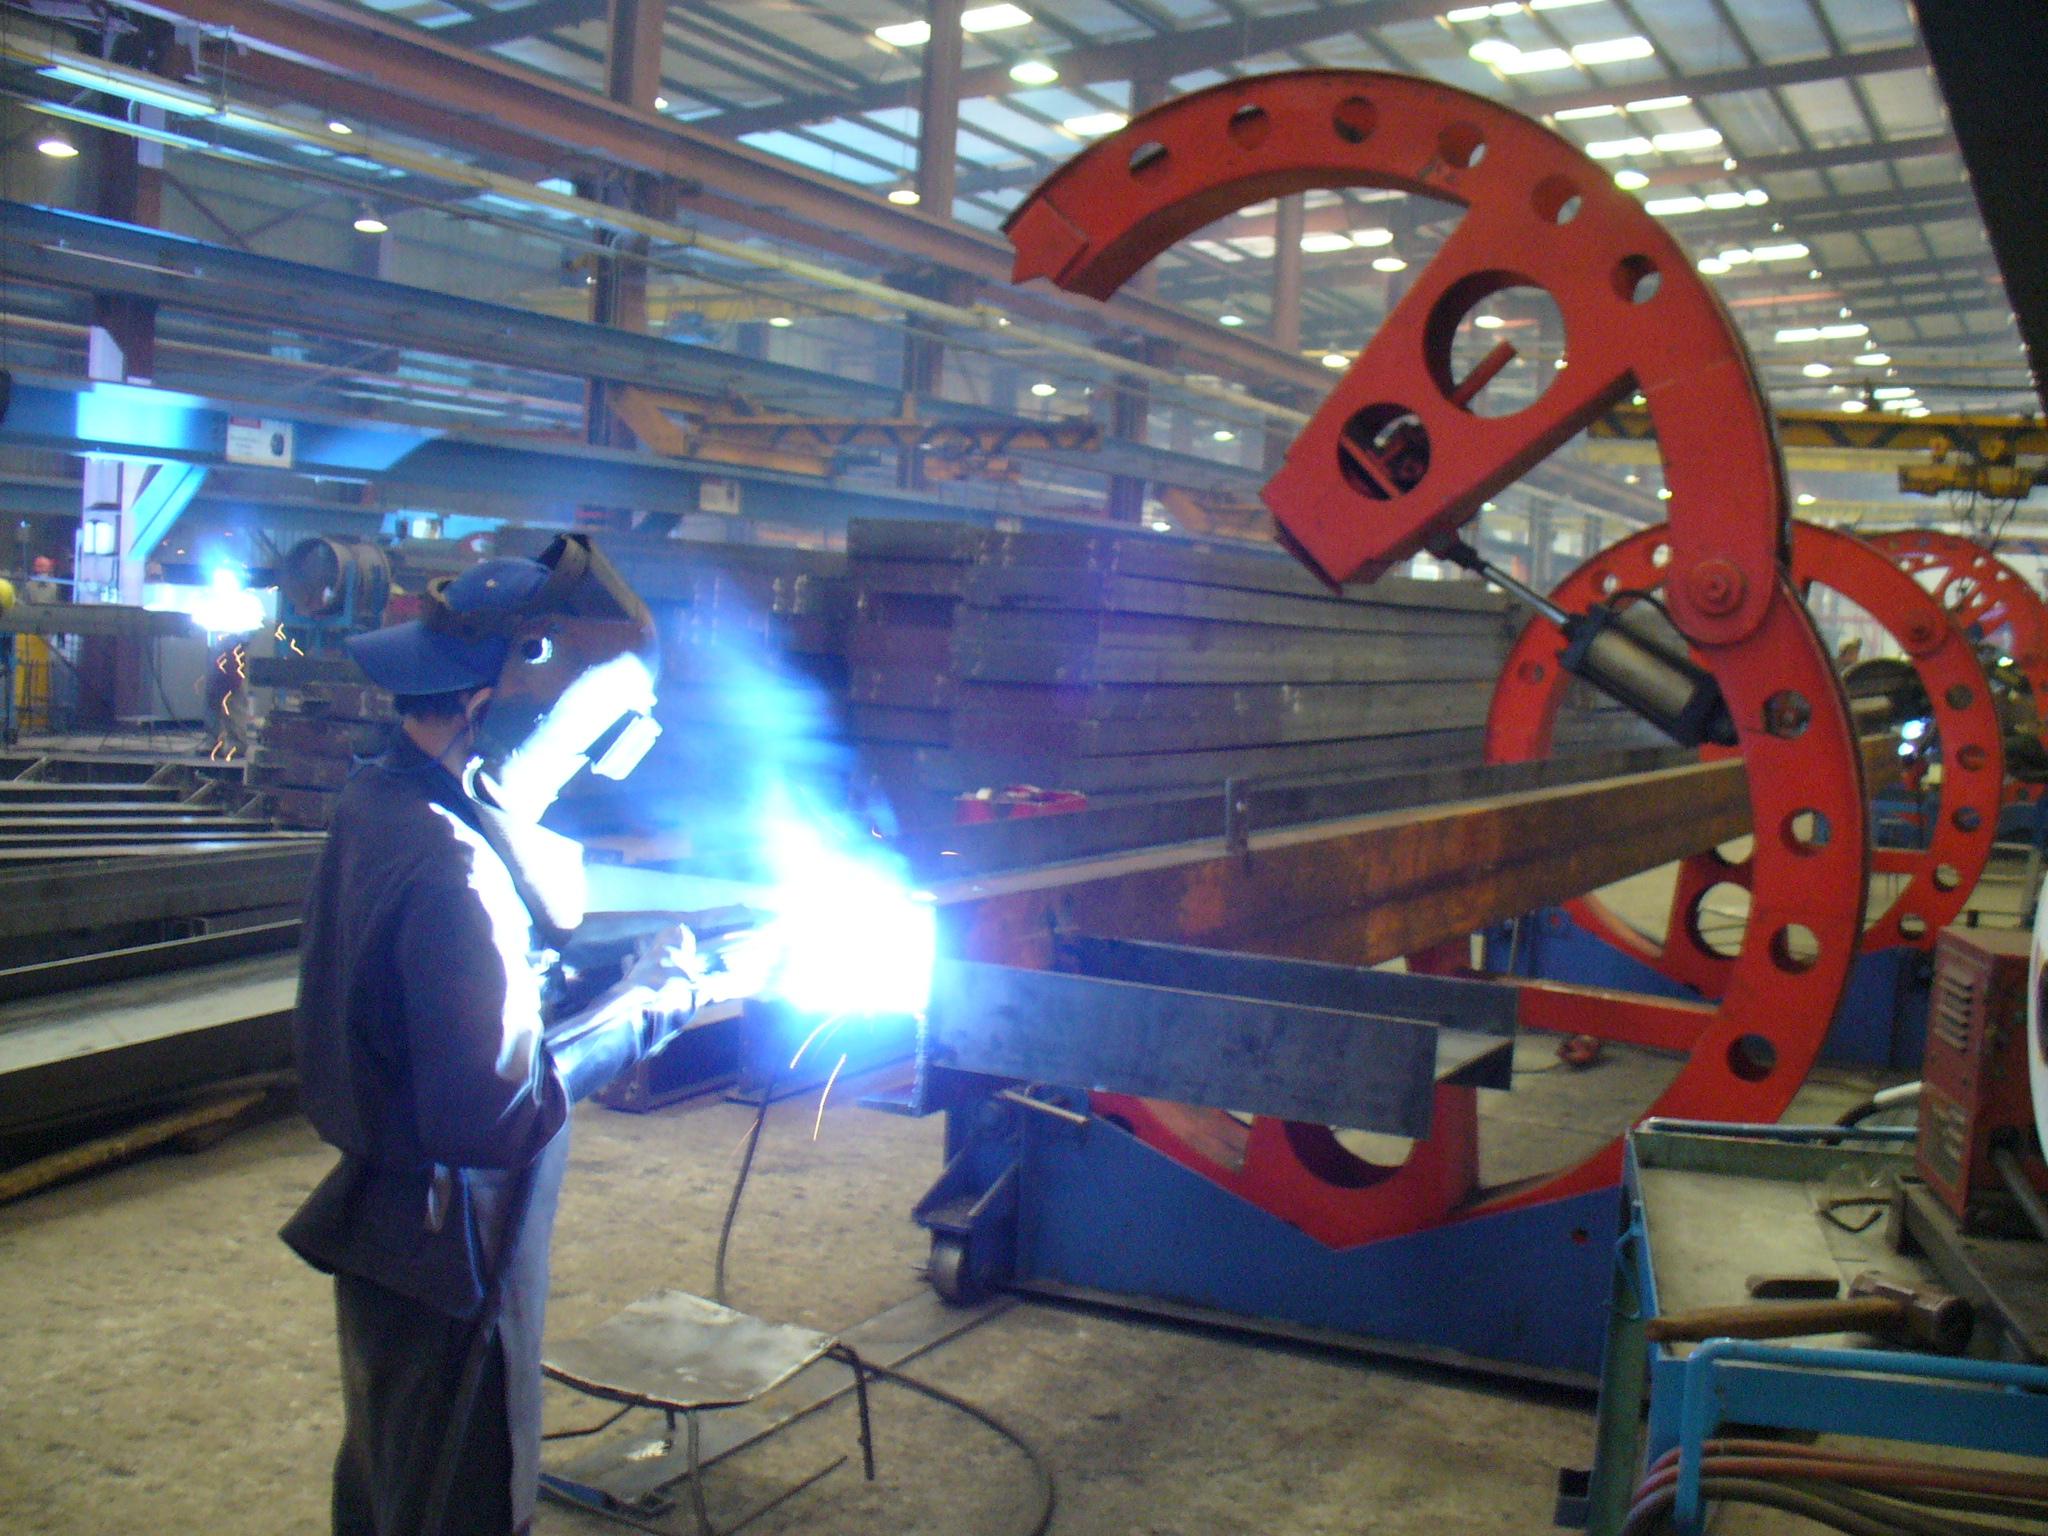 Industries Open Development Mekong Cut Engineer Iron Safety Boots Blue Leather A Welder In Vietnamese Factory Under The Ilos Improvement Programme Photo By International